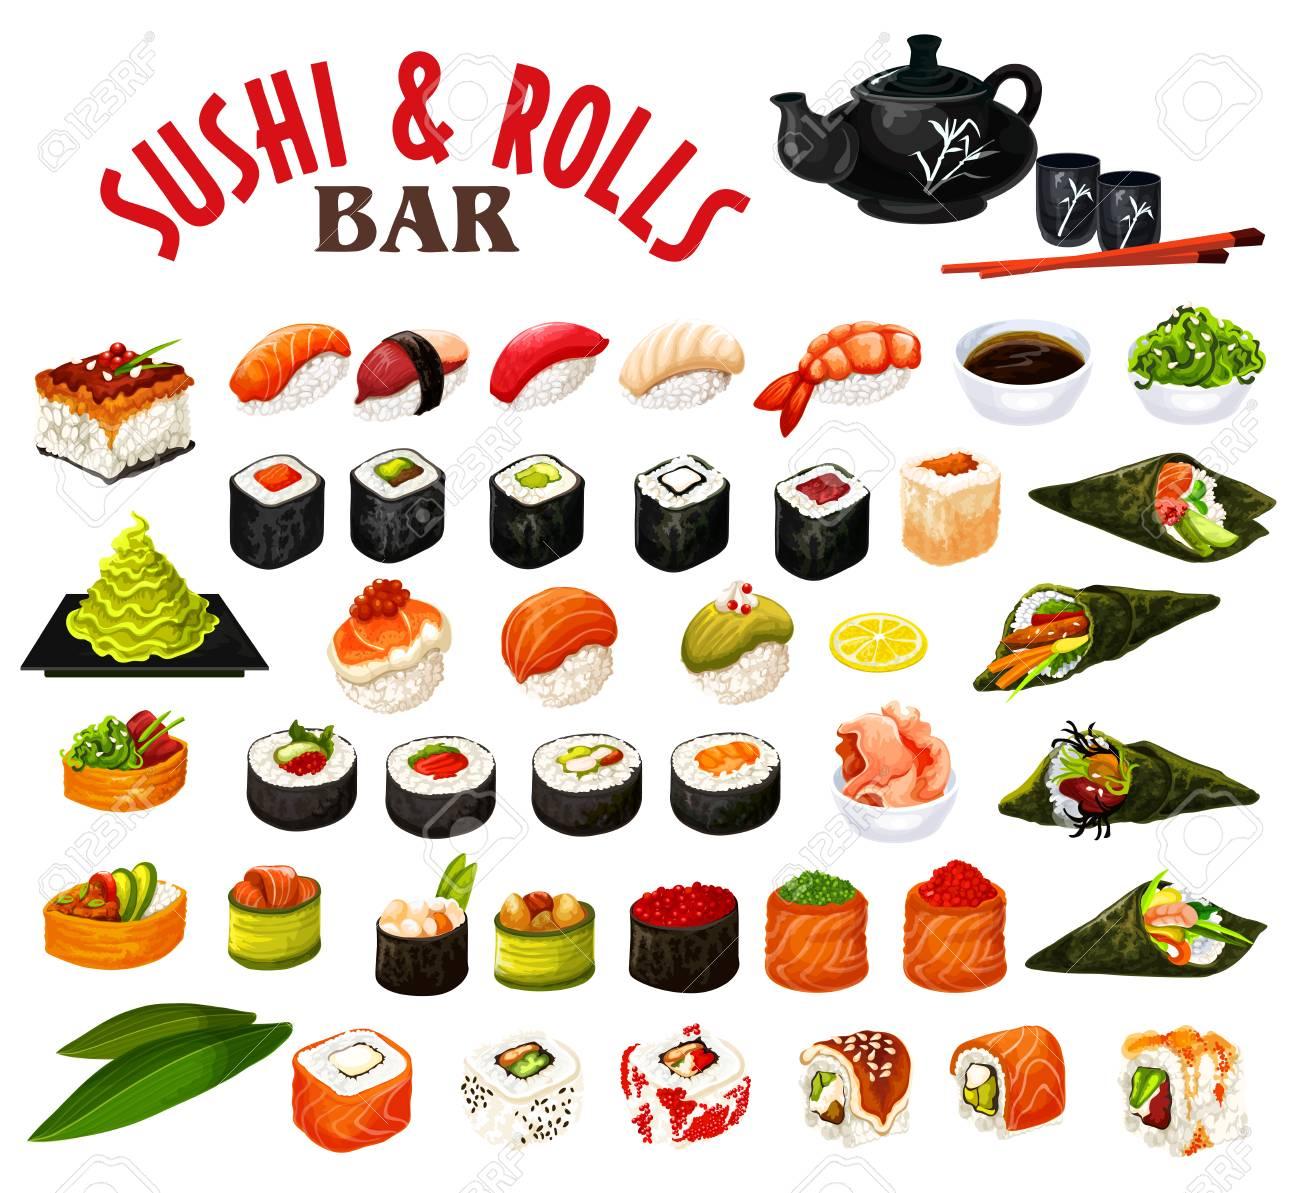 Sushi and rolls of japanese seafood with sauce and chopsticks. Vector roll, uramaki and inari, nigiri and gunkan, temaki sushi with salmon fish, rice and shrimp, seaweed nori, tuna, caviar and avocado - 110467675